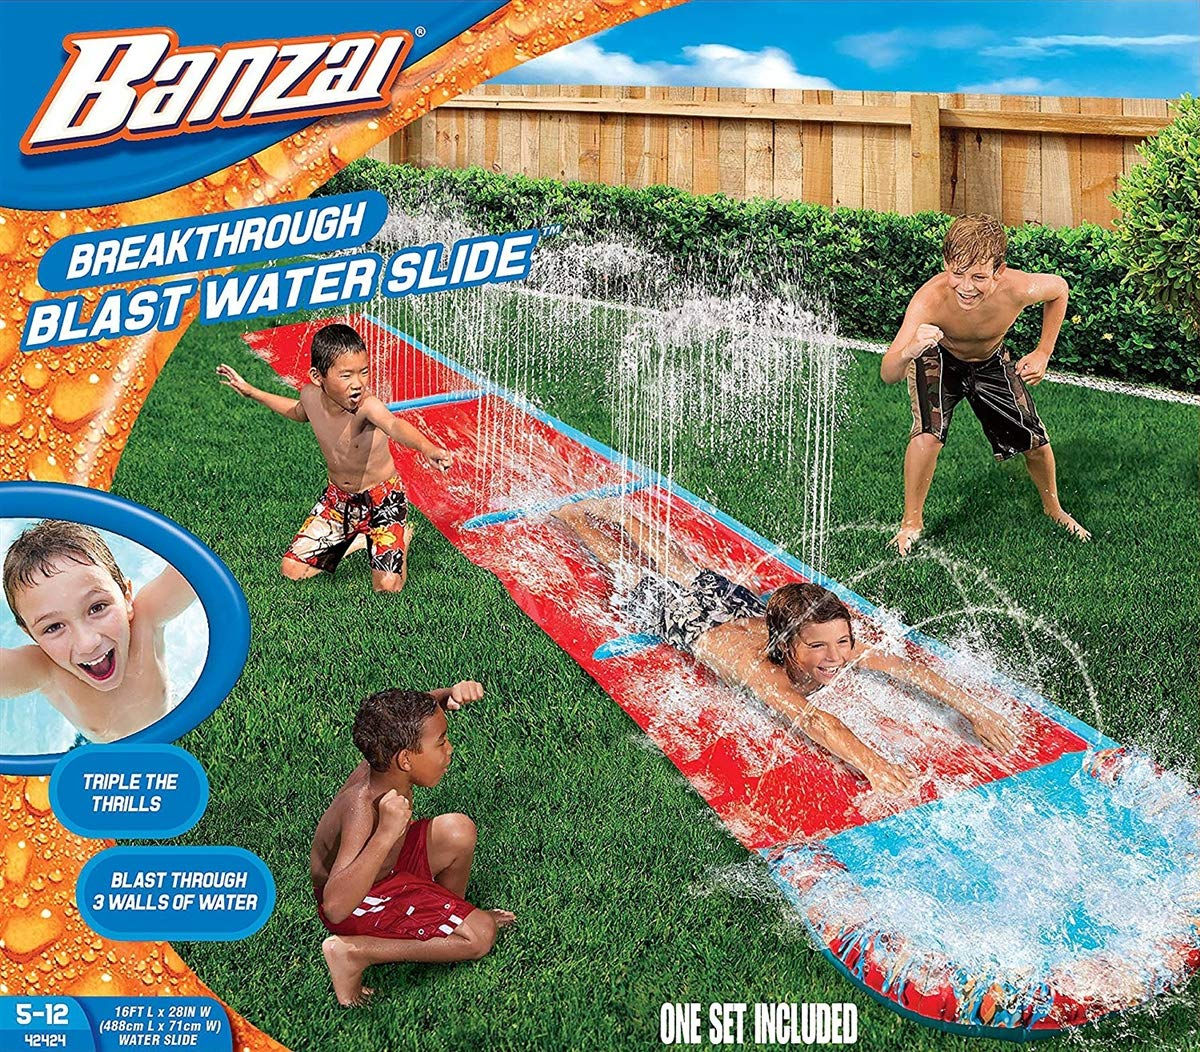 BANZAI 16ft x 28in Breakthrough Blast Water Slide (Single Slide) by BANZAI